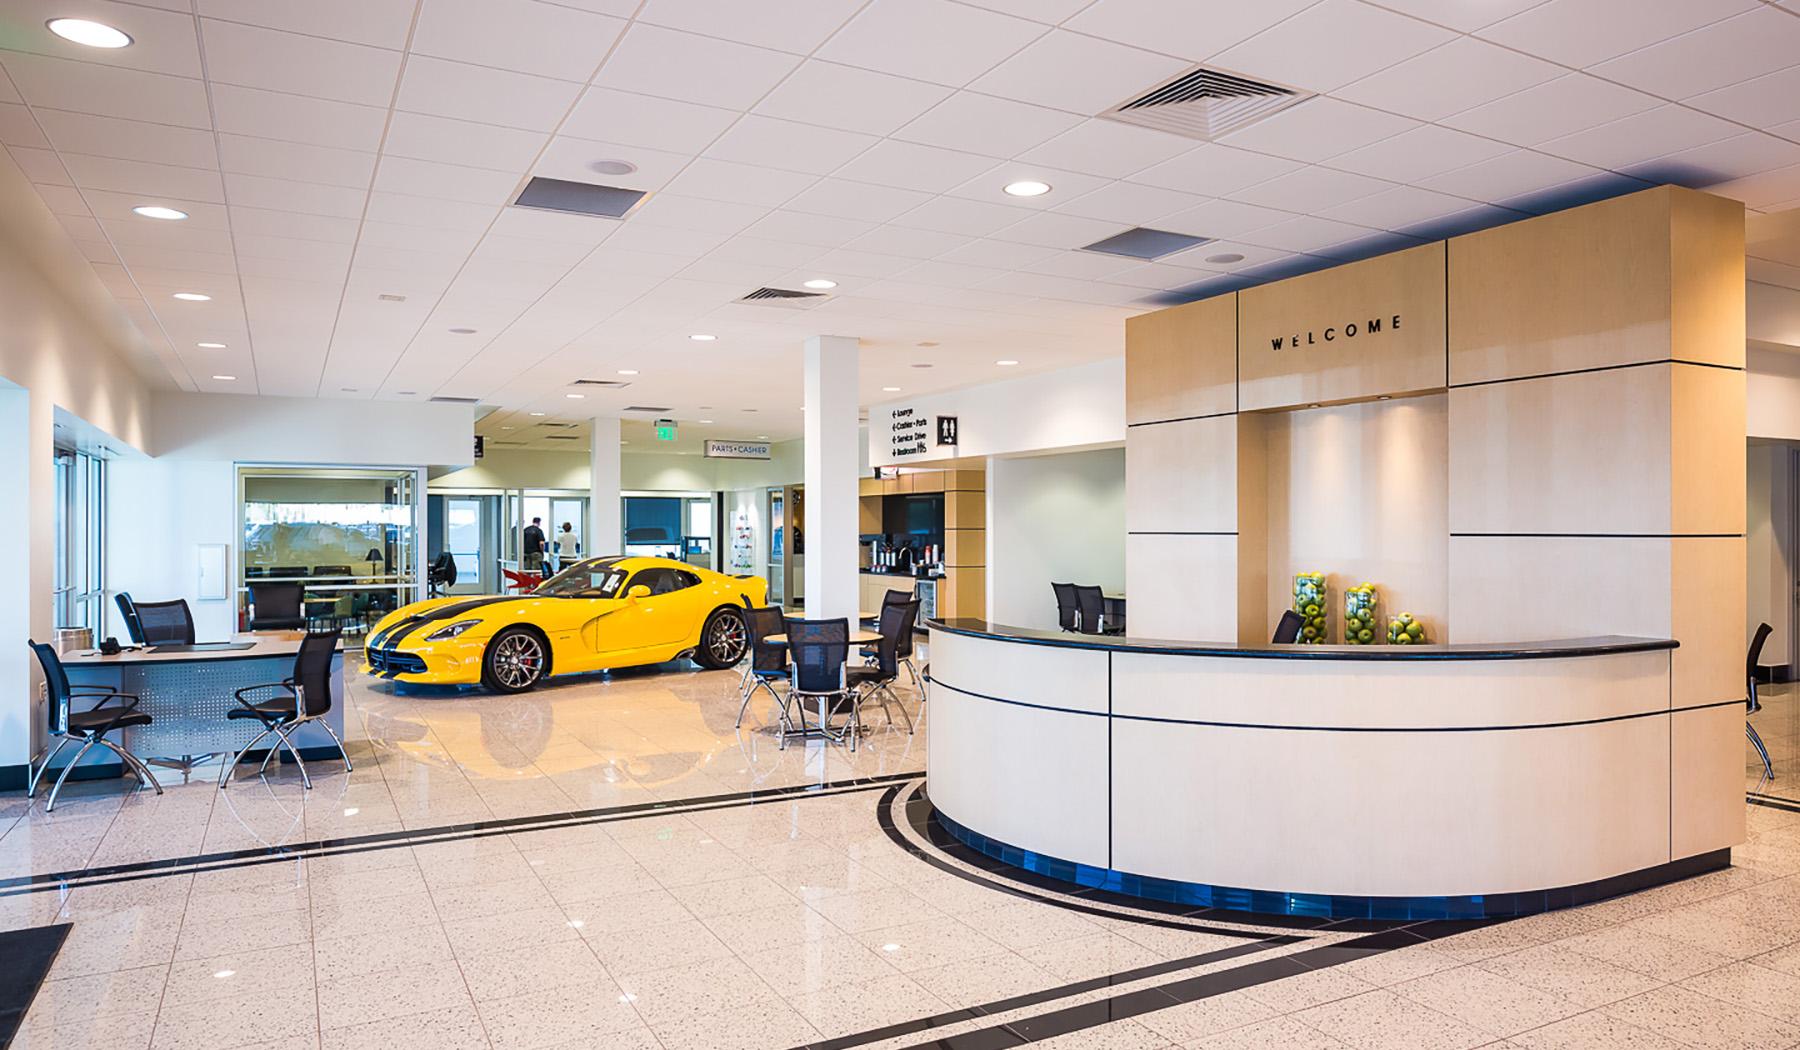 Jim Click Chrysler/Jeep And Dodge Renovations